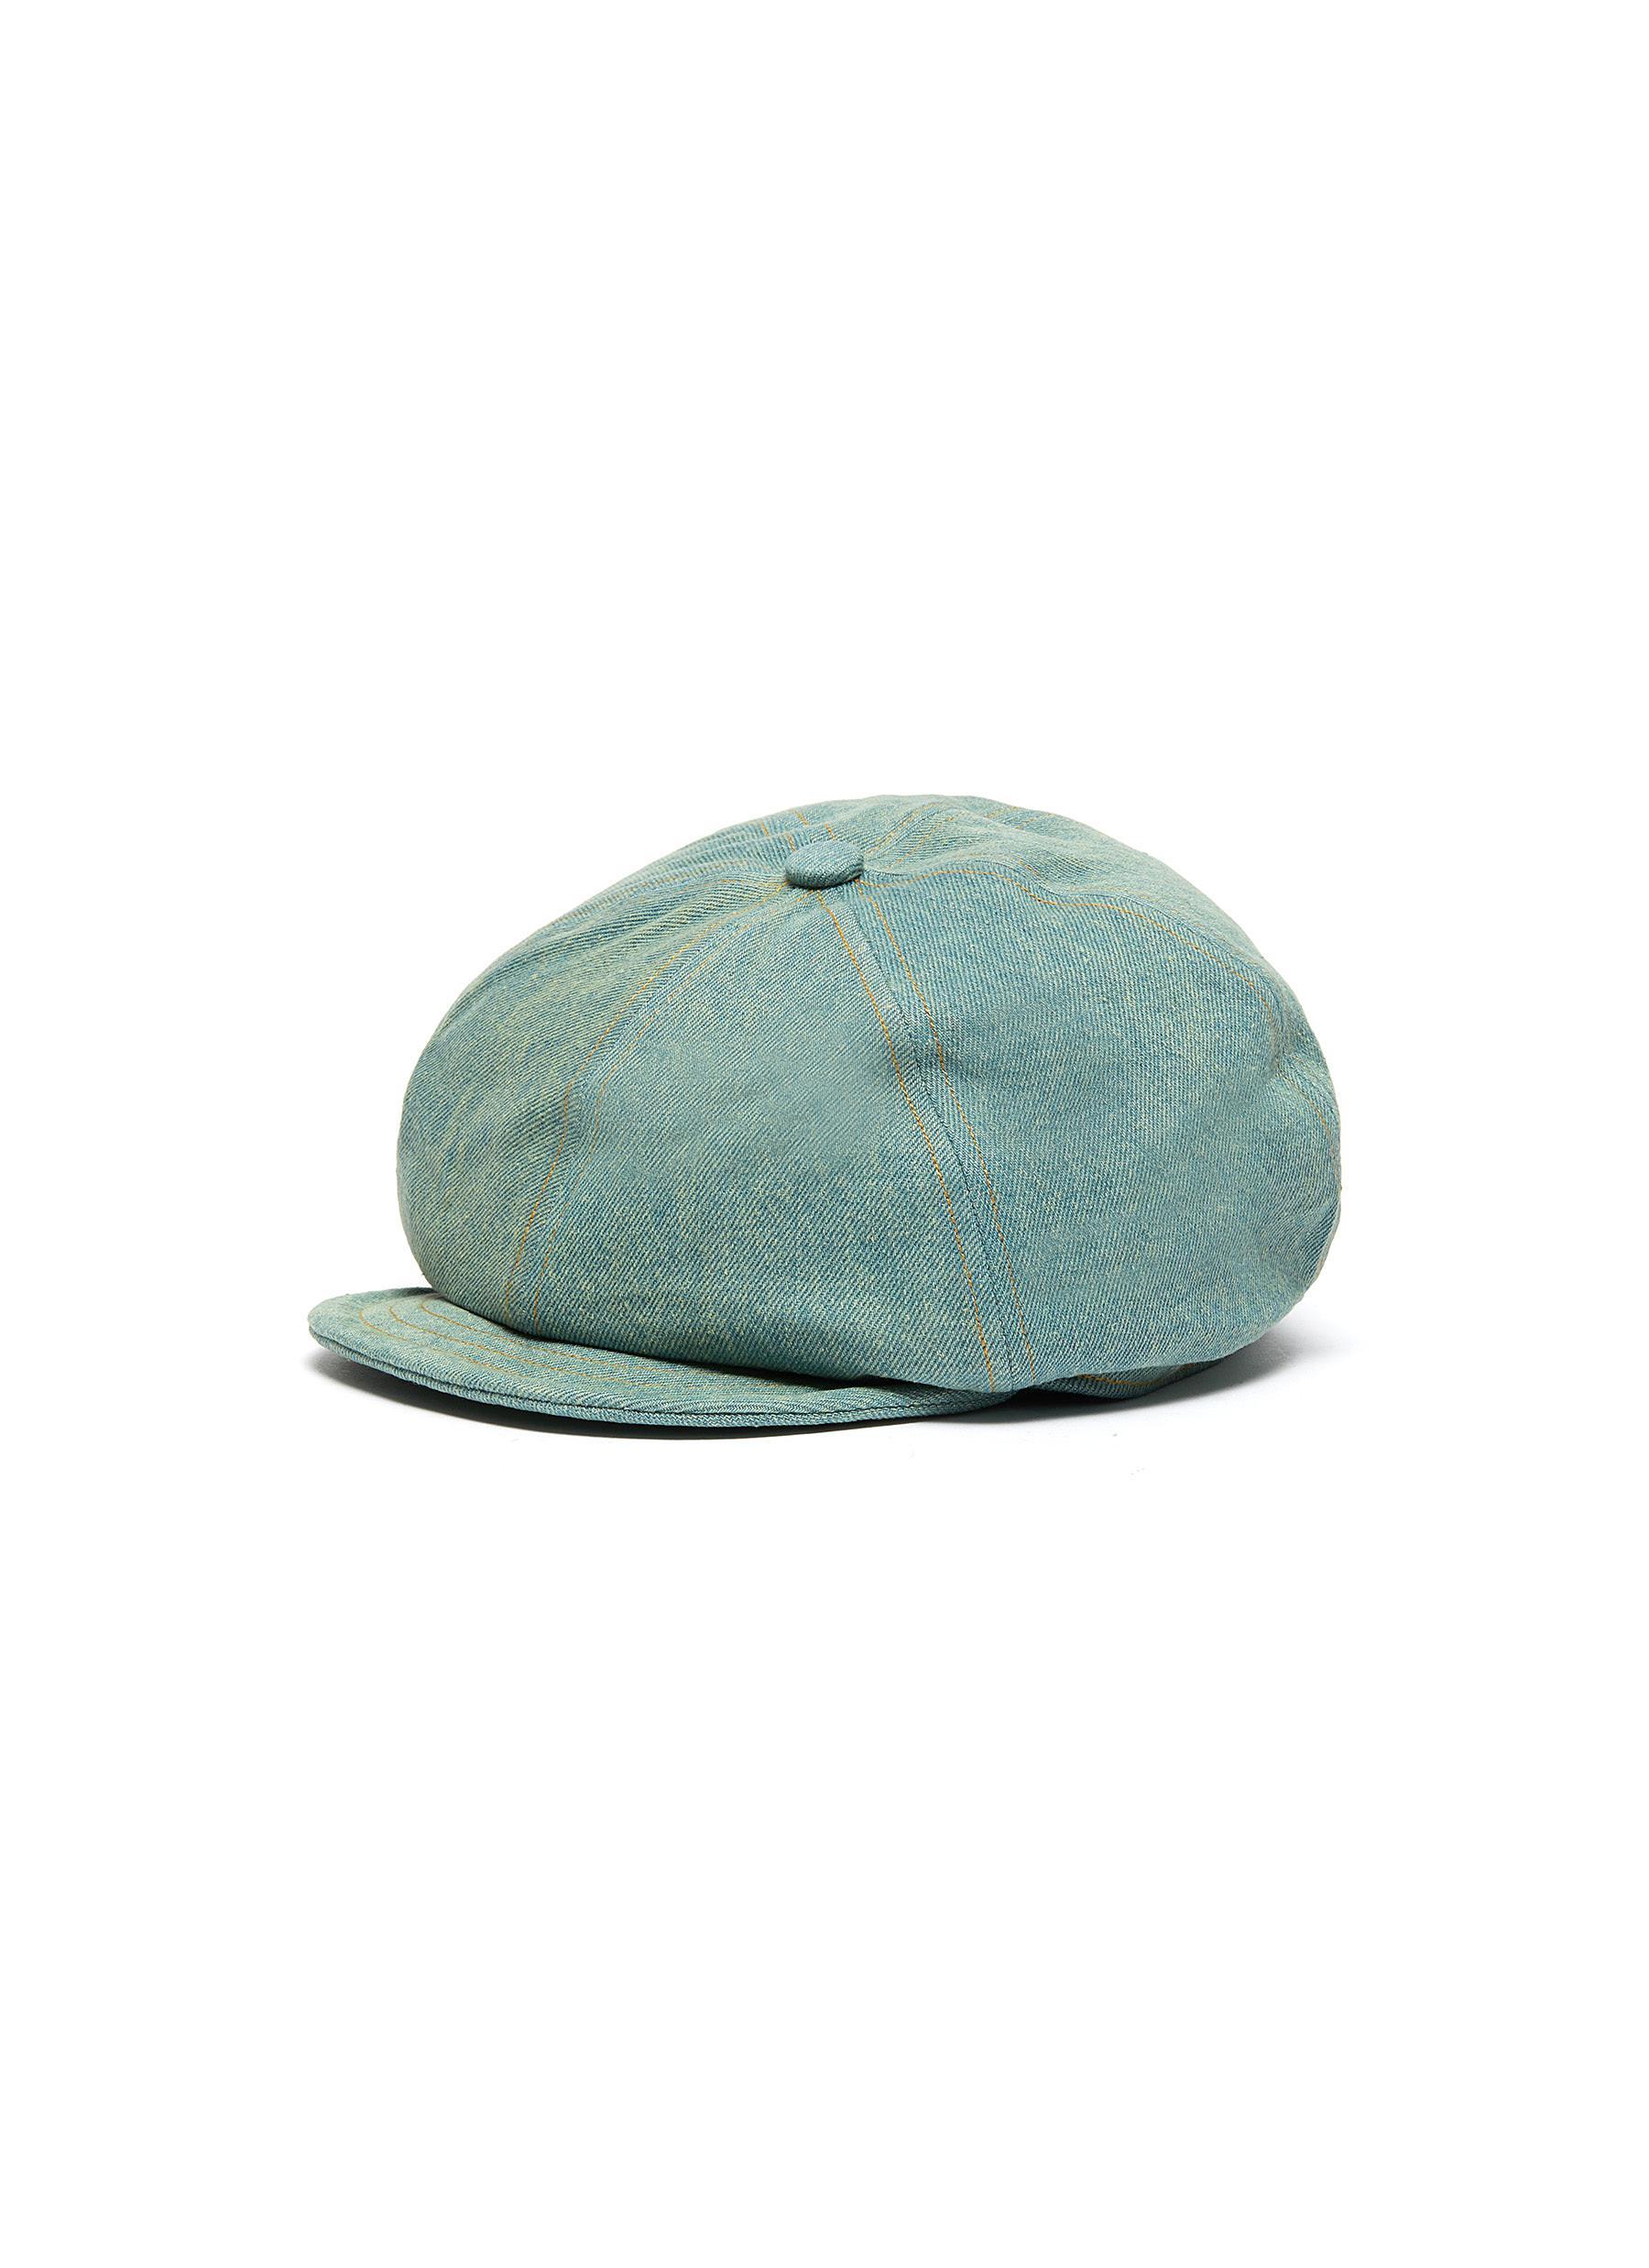 Denim newsboy cap